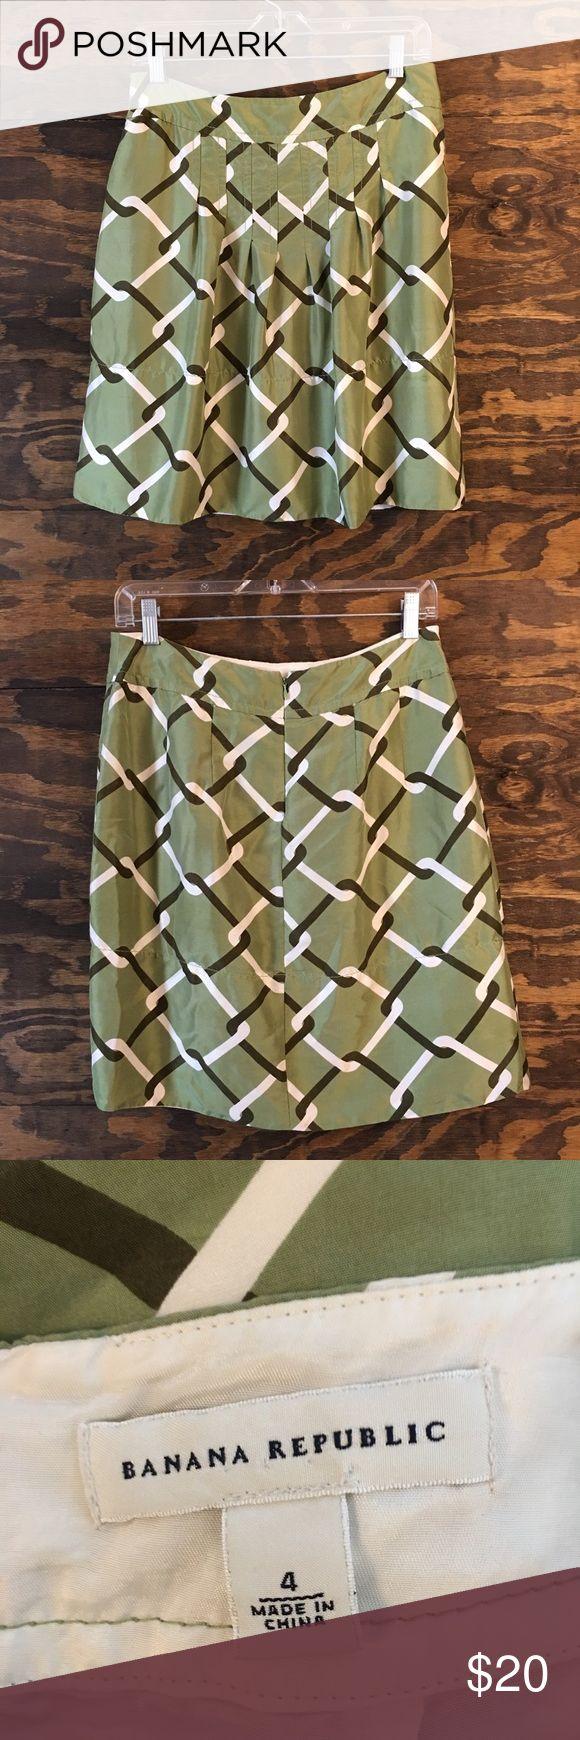 Banana Republic Green Skirt Size 4 Green & White Checkered Skirt Banana Republic Skirts